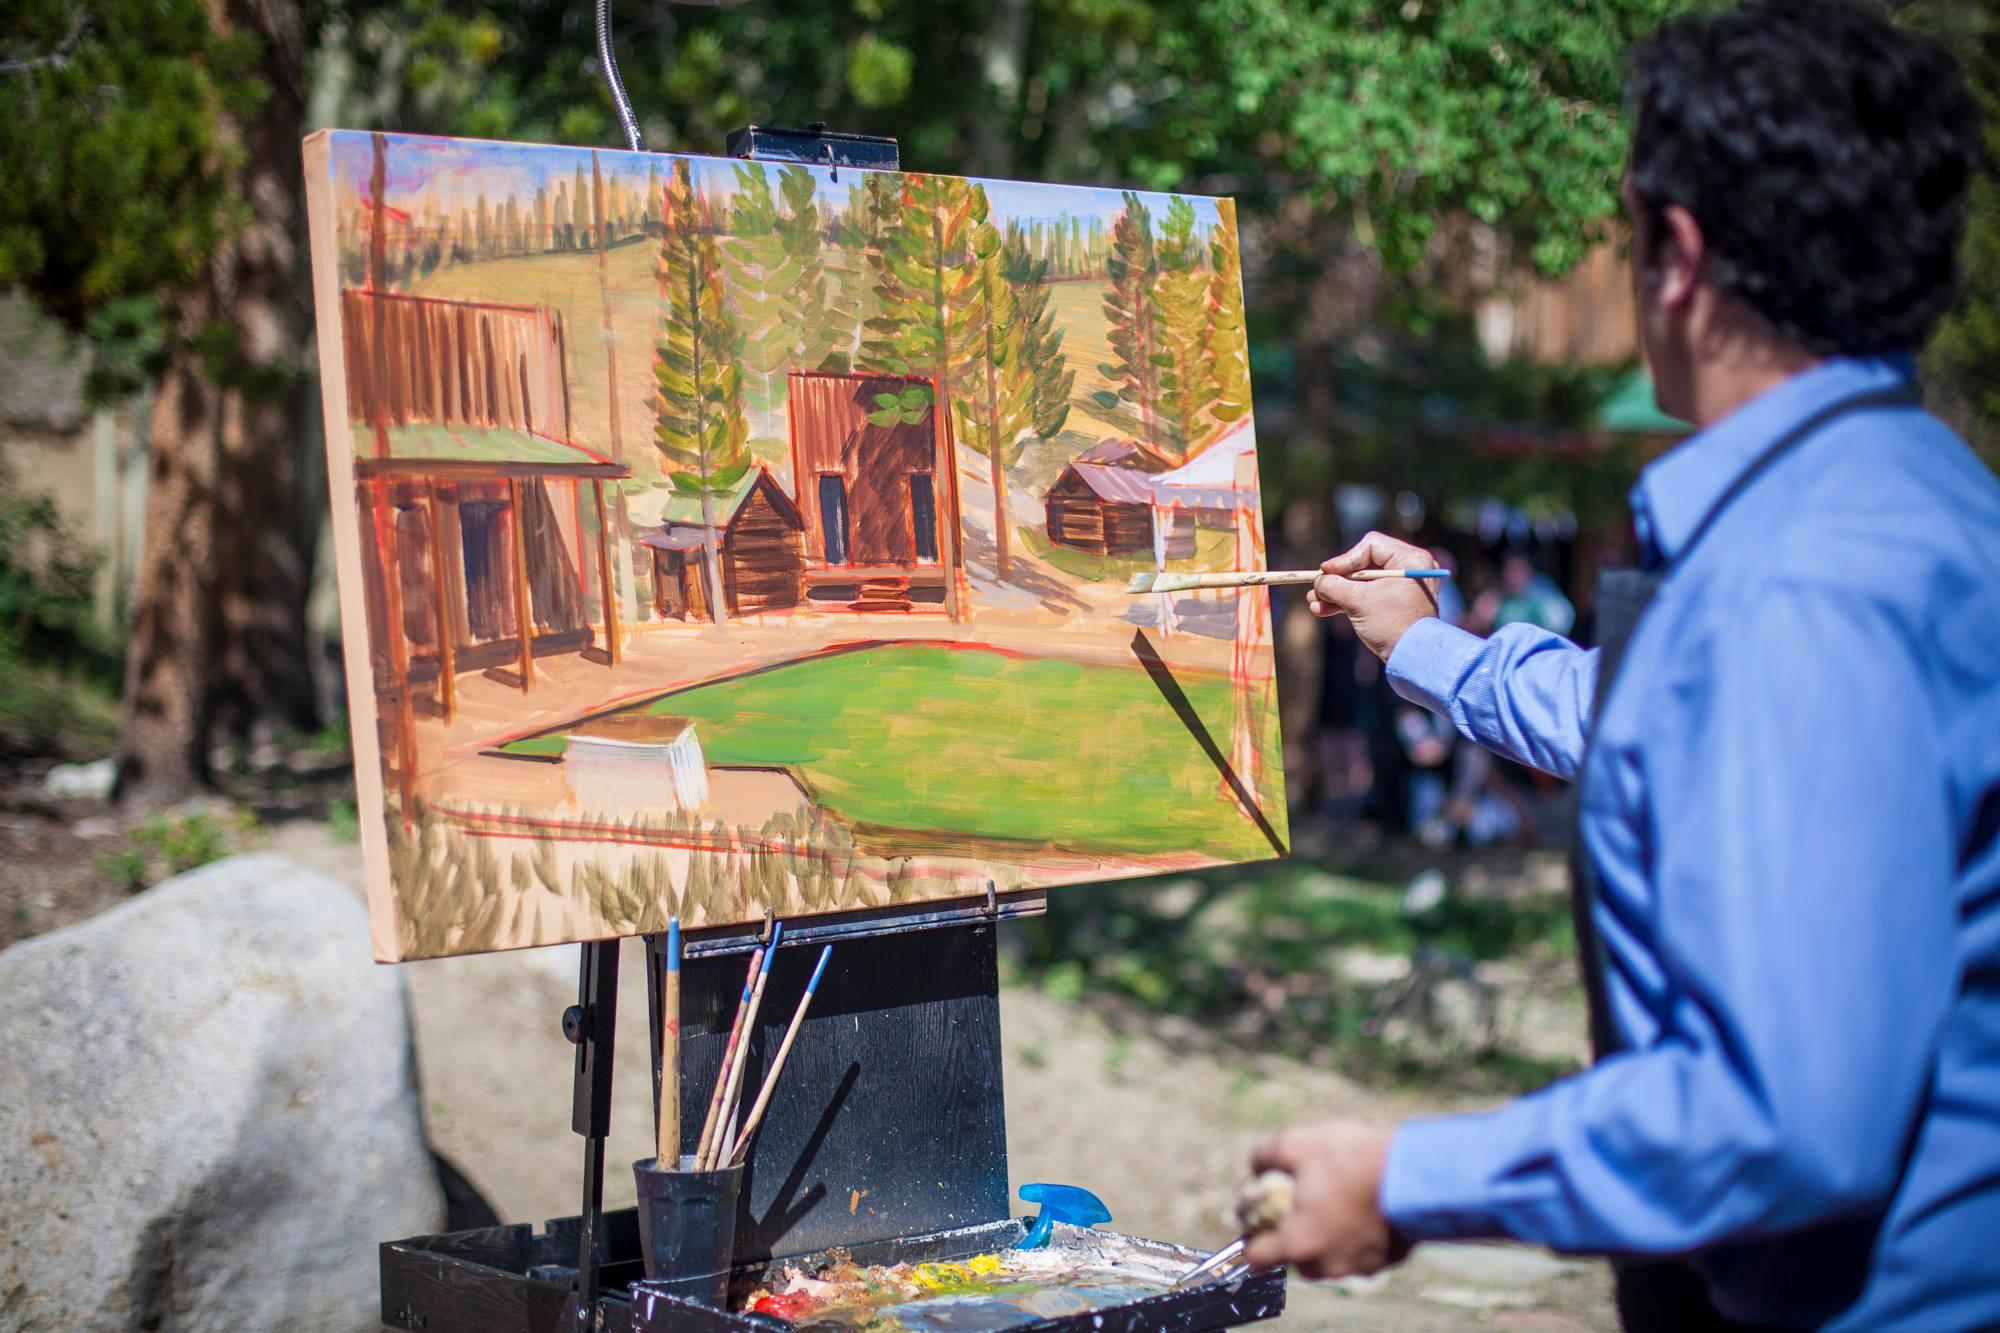 wedding-painting-beginning-at-wedding-reception-dry-gulch-placer-breckenridge-colorado-wedding-artist-live